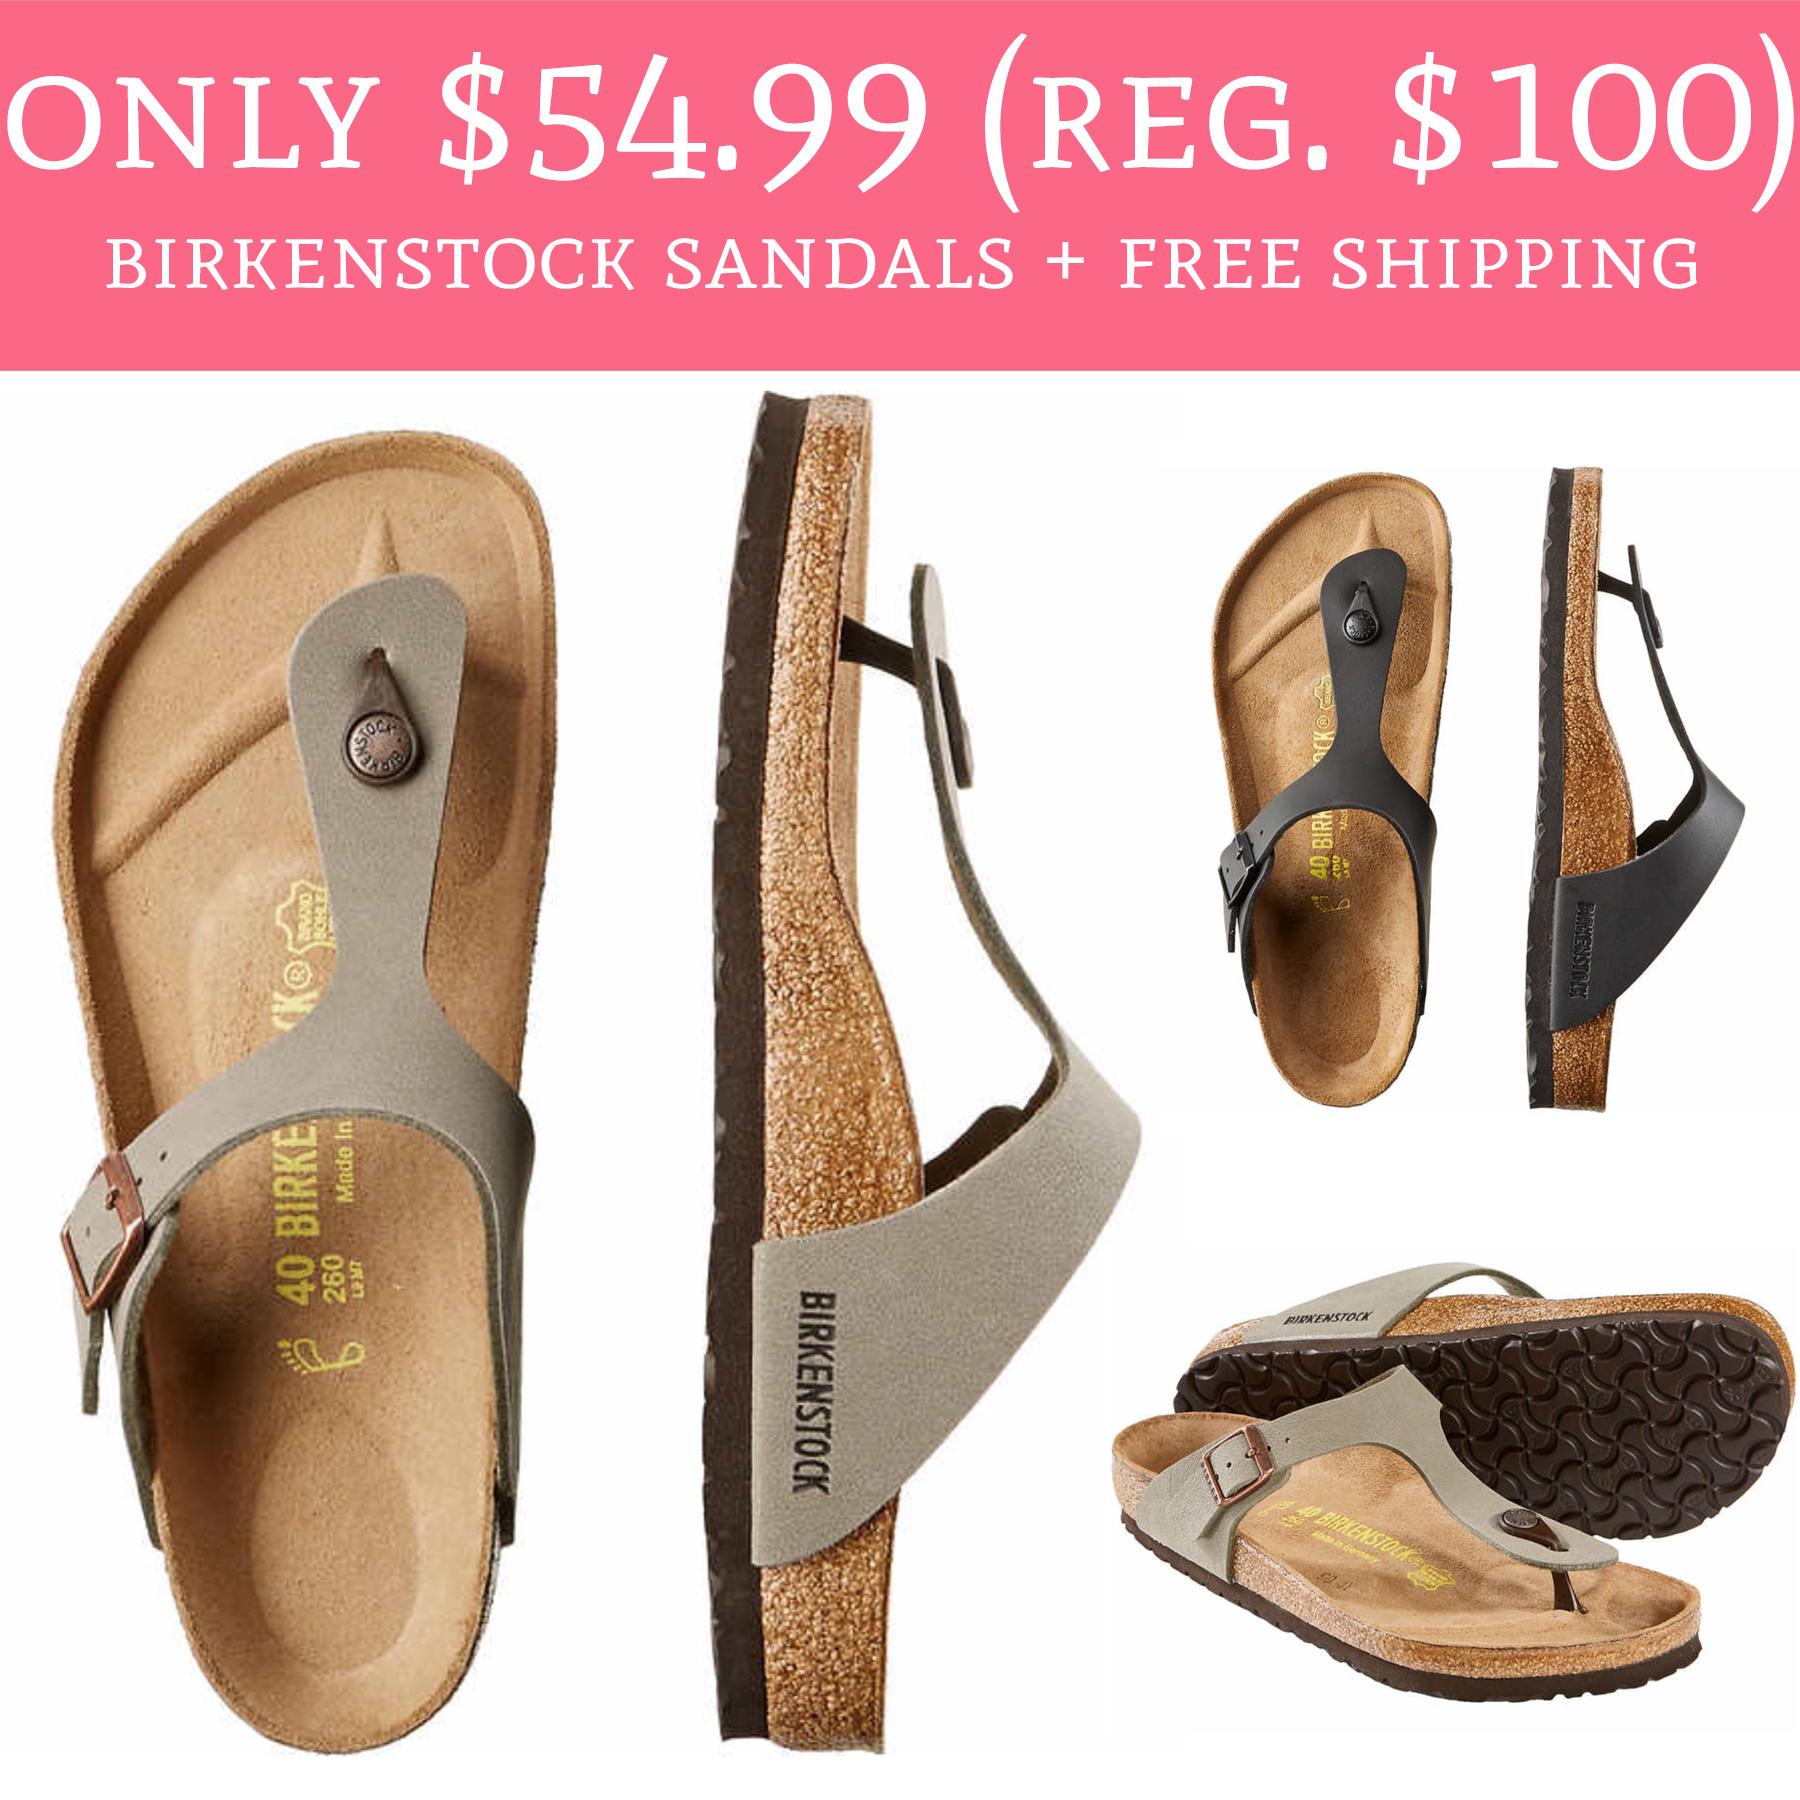 cheap for discount 3f05e 17028 Only $54.99 (Regular $100) Birkenstock Sandals + FREE ...